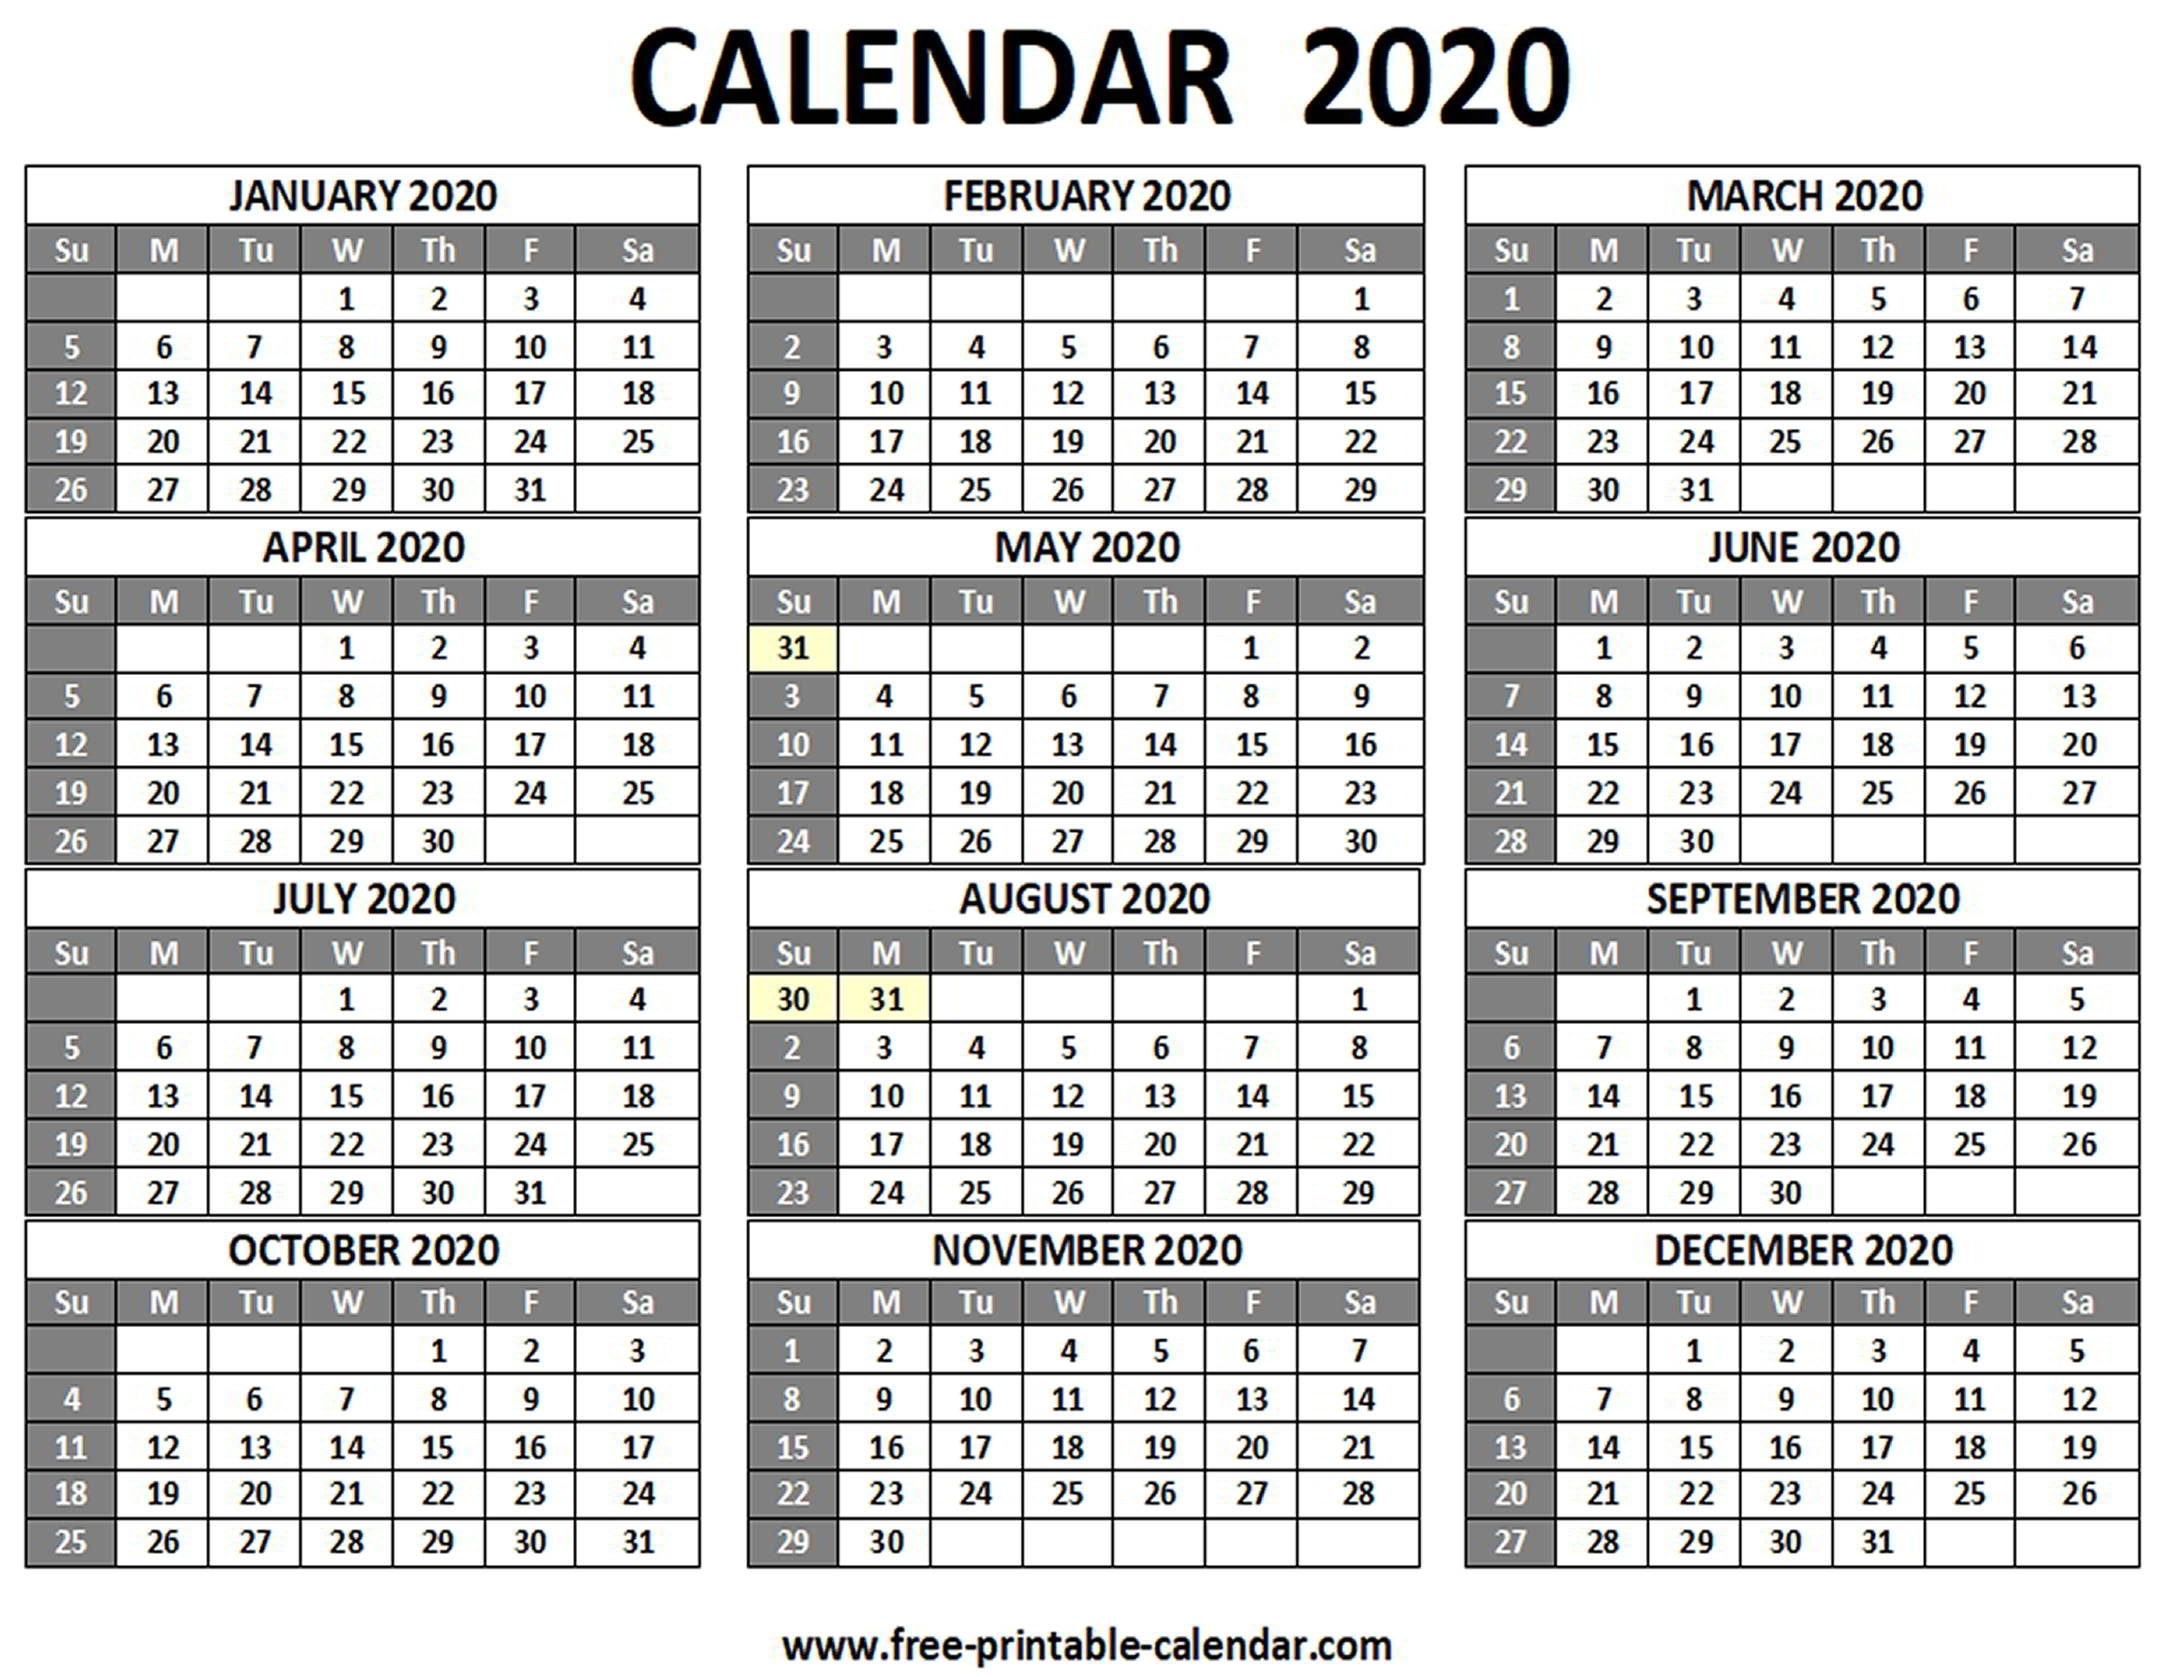 Printable 2020 Calendar - Free-Printable-Calendar pertaining to 2020 12 Month Calendar Printable